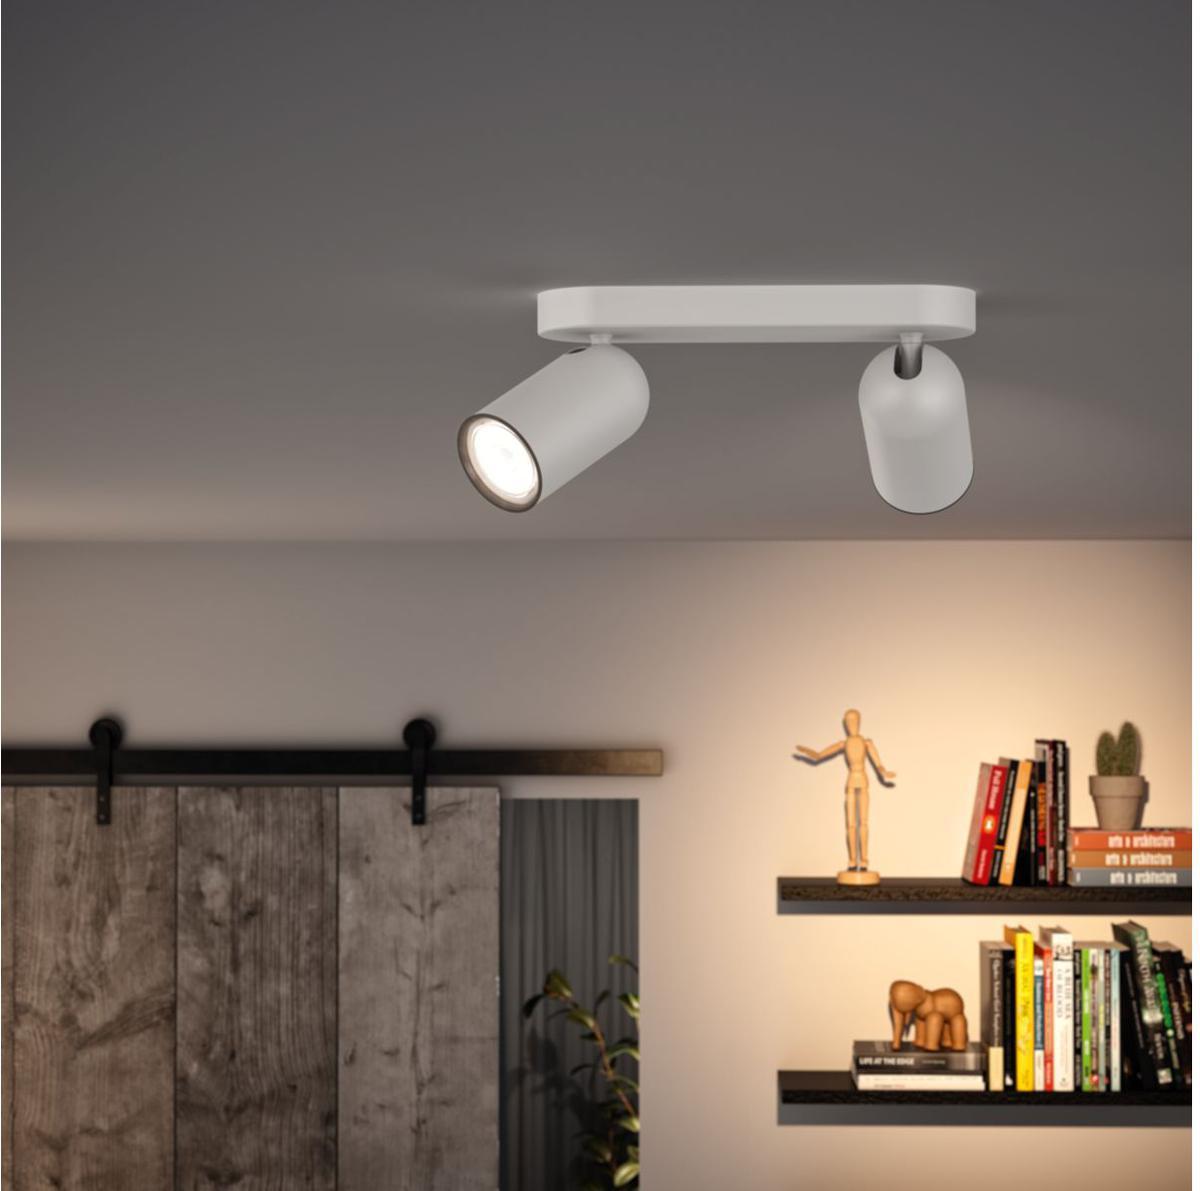 Philips LED Spotlicht GU10 2x10W Tageslicht weiss Pongee 50582/31/PN